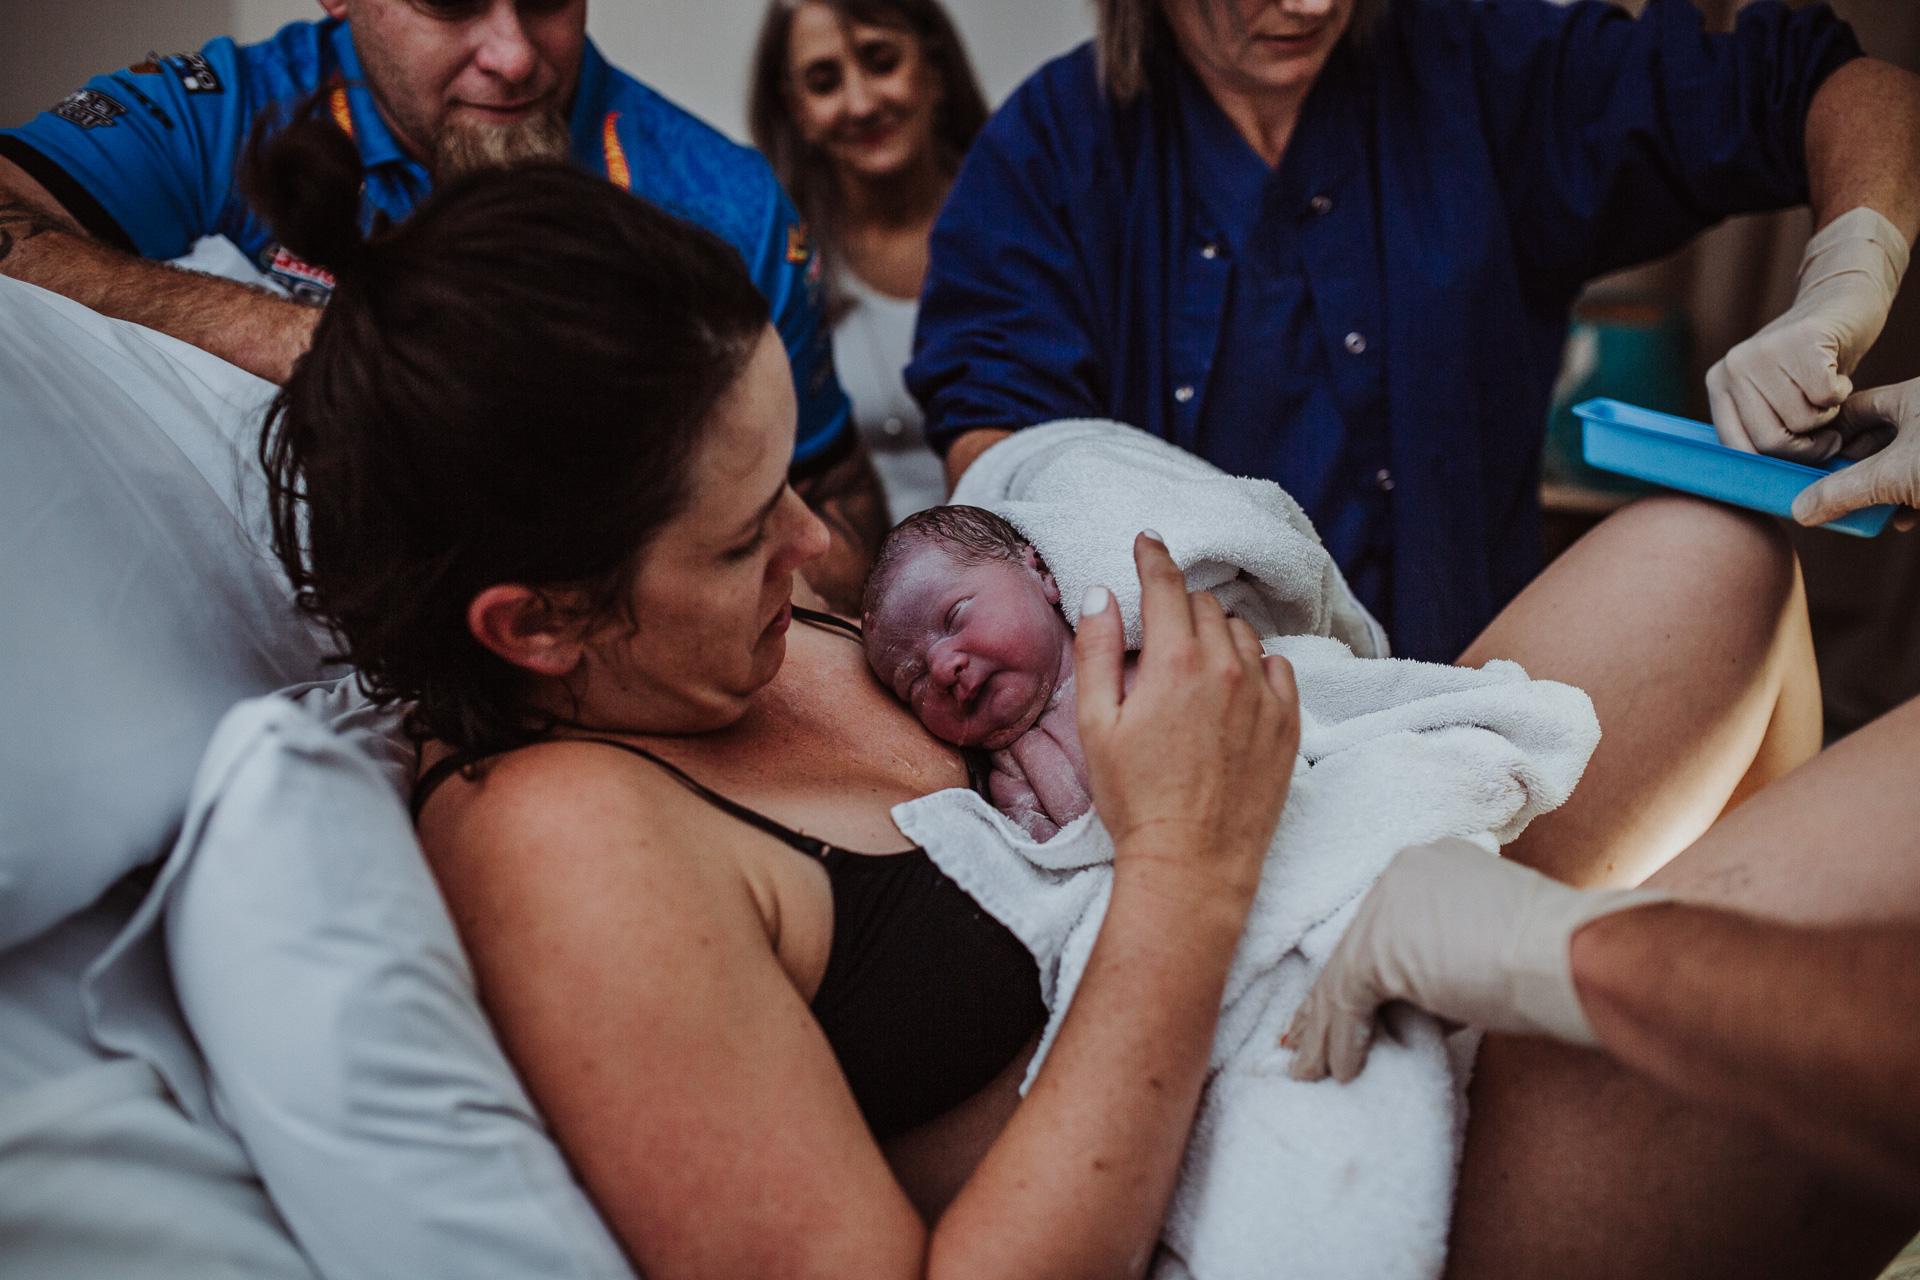 LDP_5733Townsville-Queensland-Australian-Birth-and-Fresh-48-Newborn-Hospital-Photographer.jpg